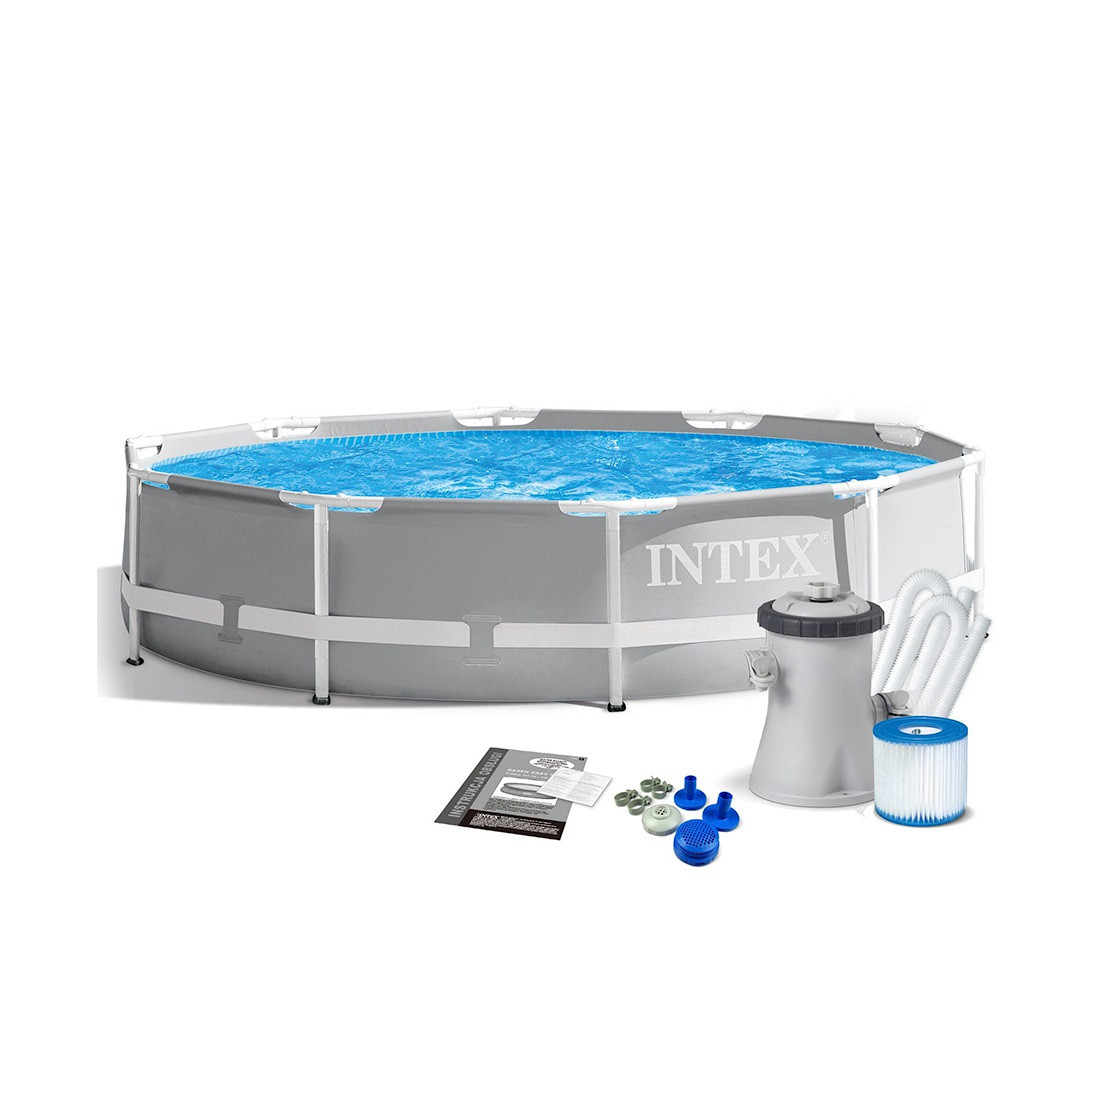 Каркасный бассейн Intex 26702NP (305* 76 см)4485 л